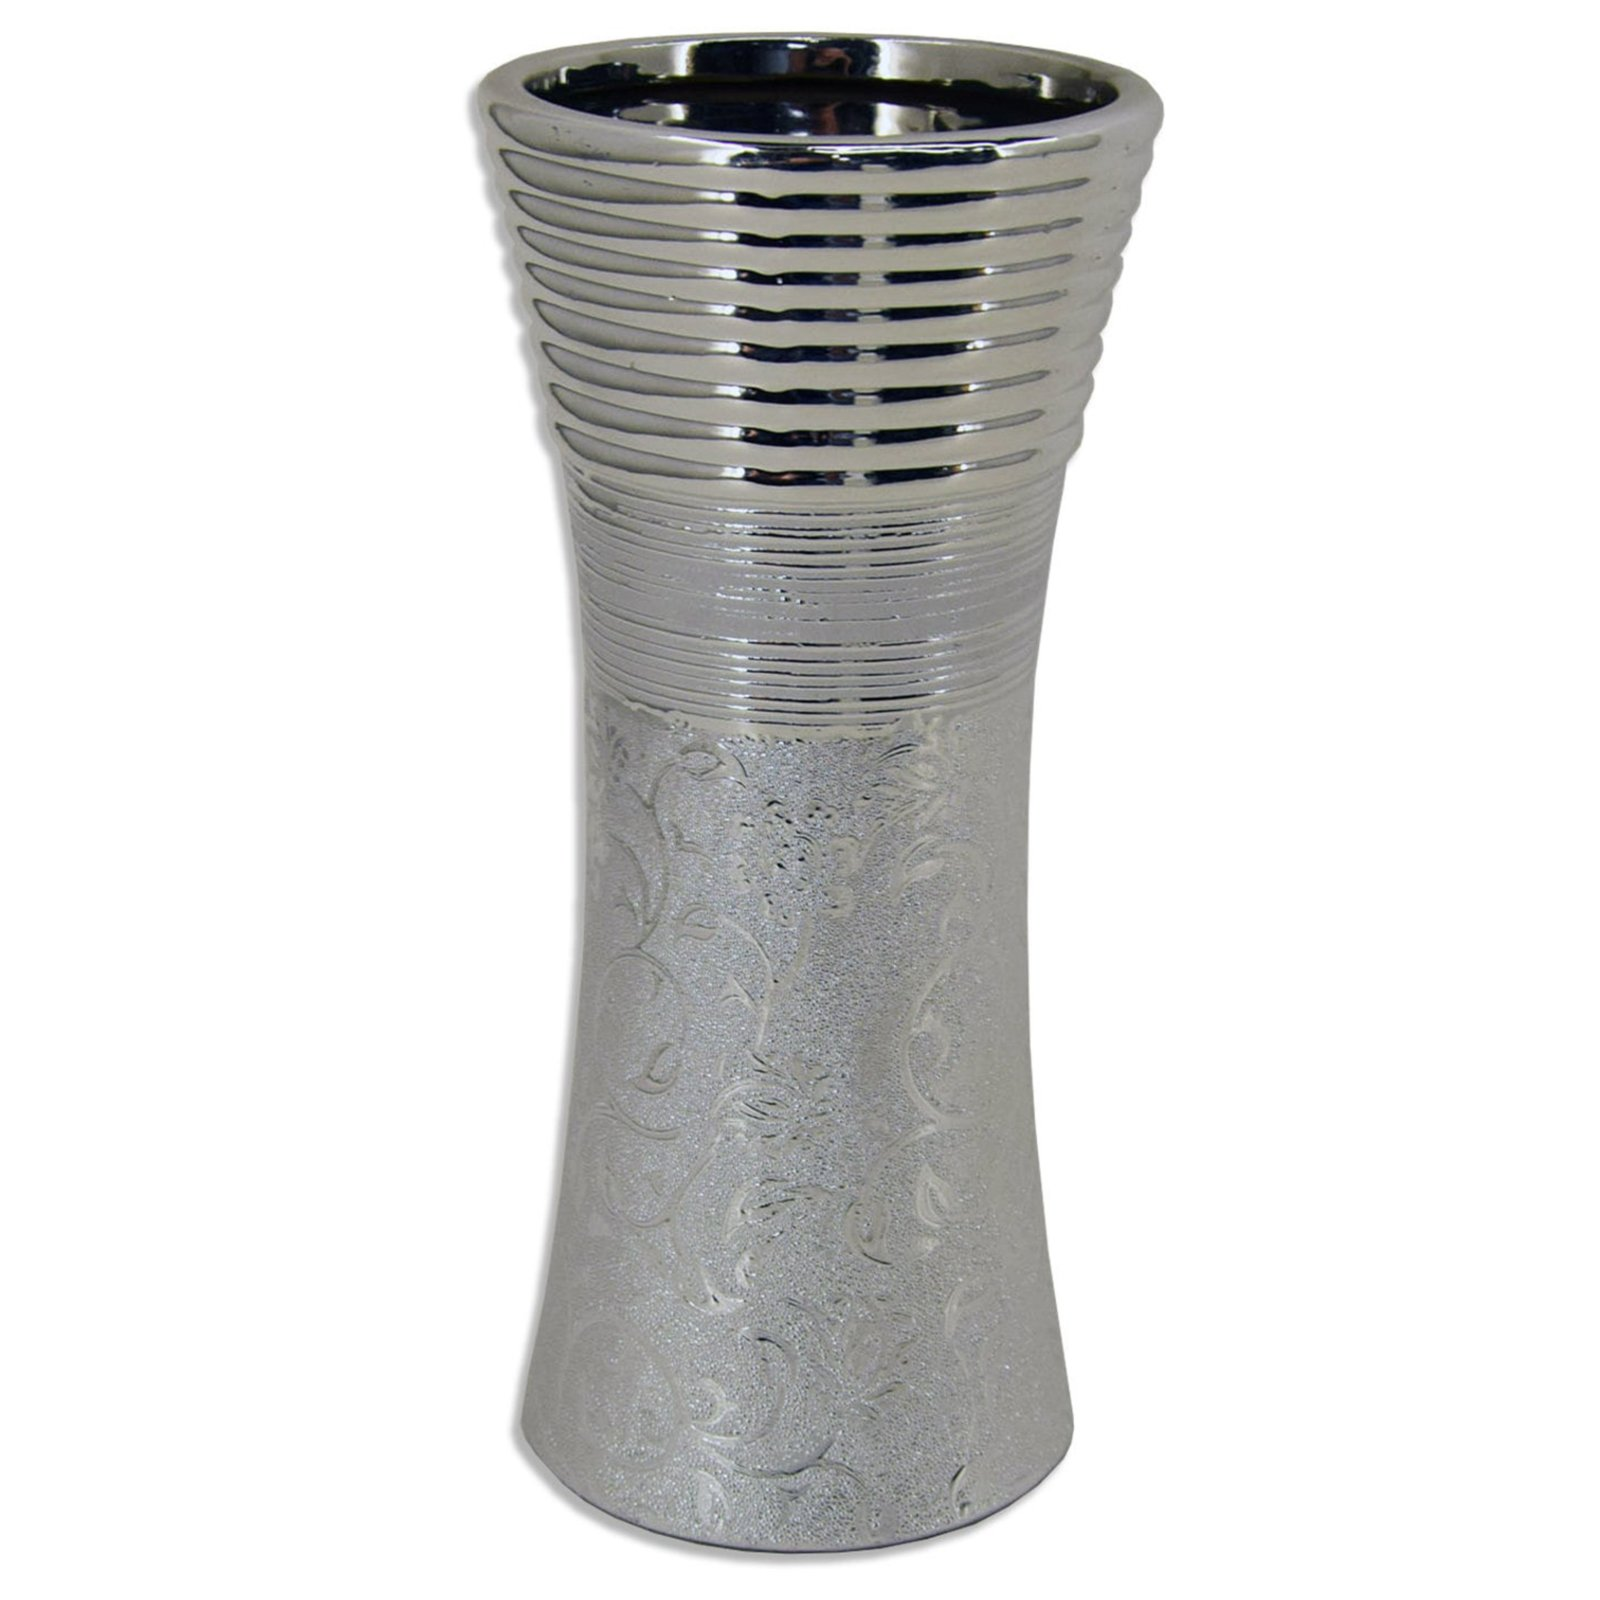 vase silber 25 cm hoch vasen deko artikel deko haushalt roller m belhaus. Black Bedroom Furniture Sets. Home Design Ideas